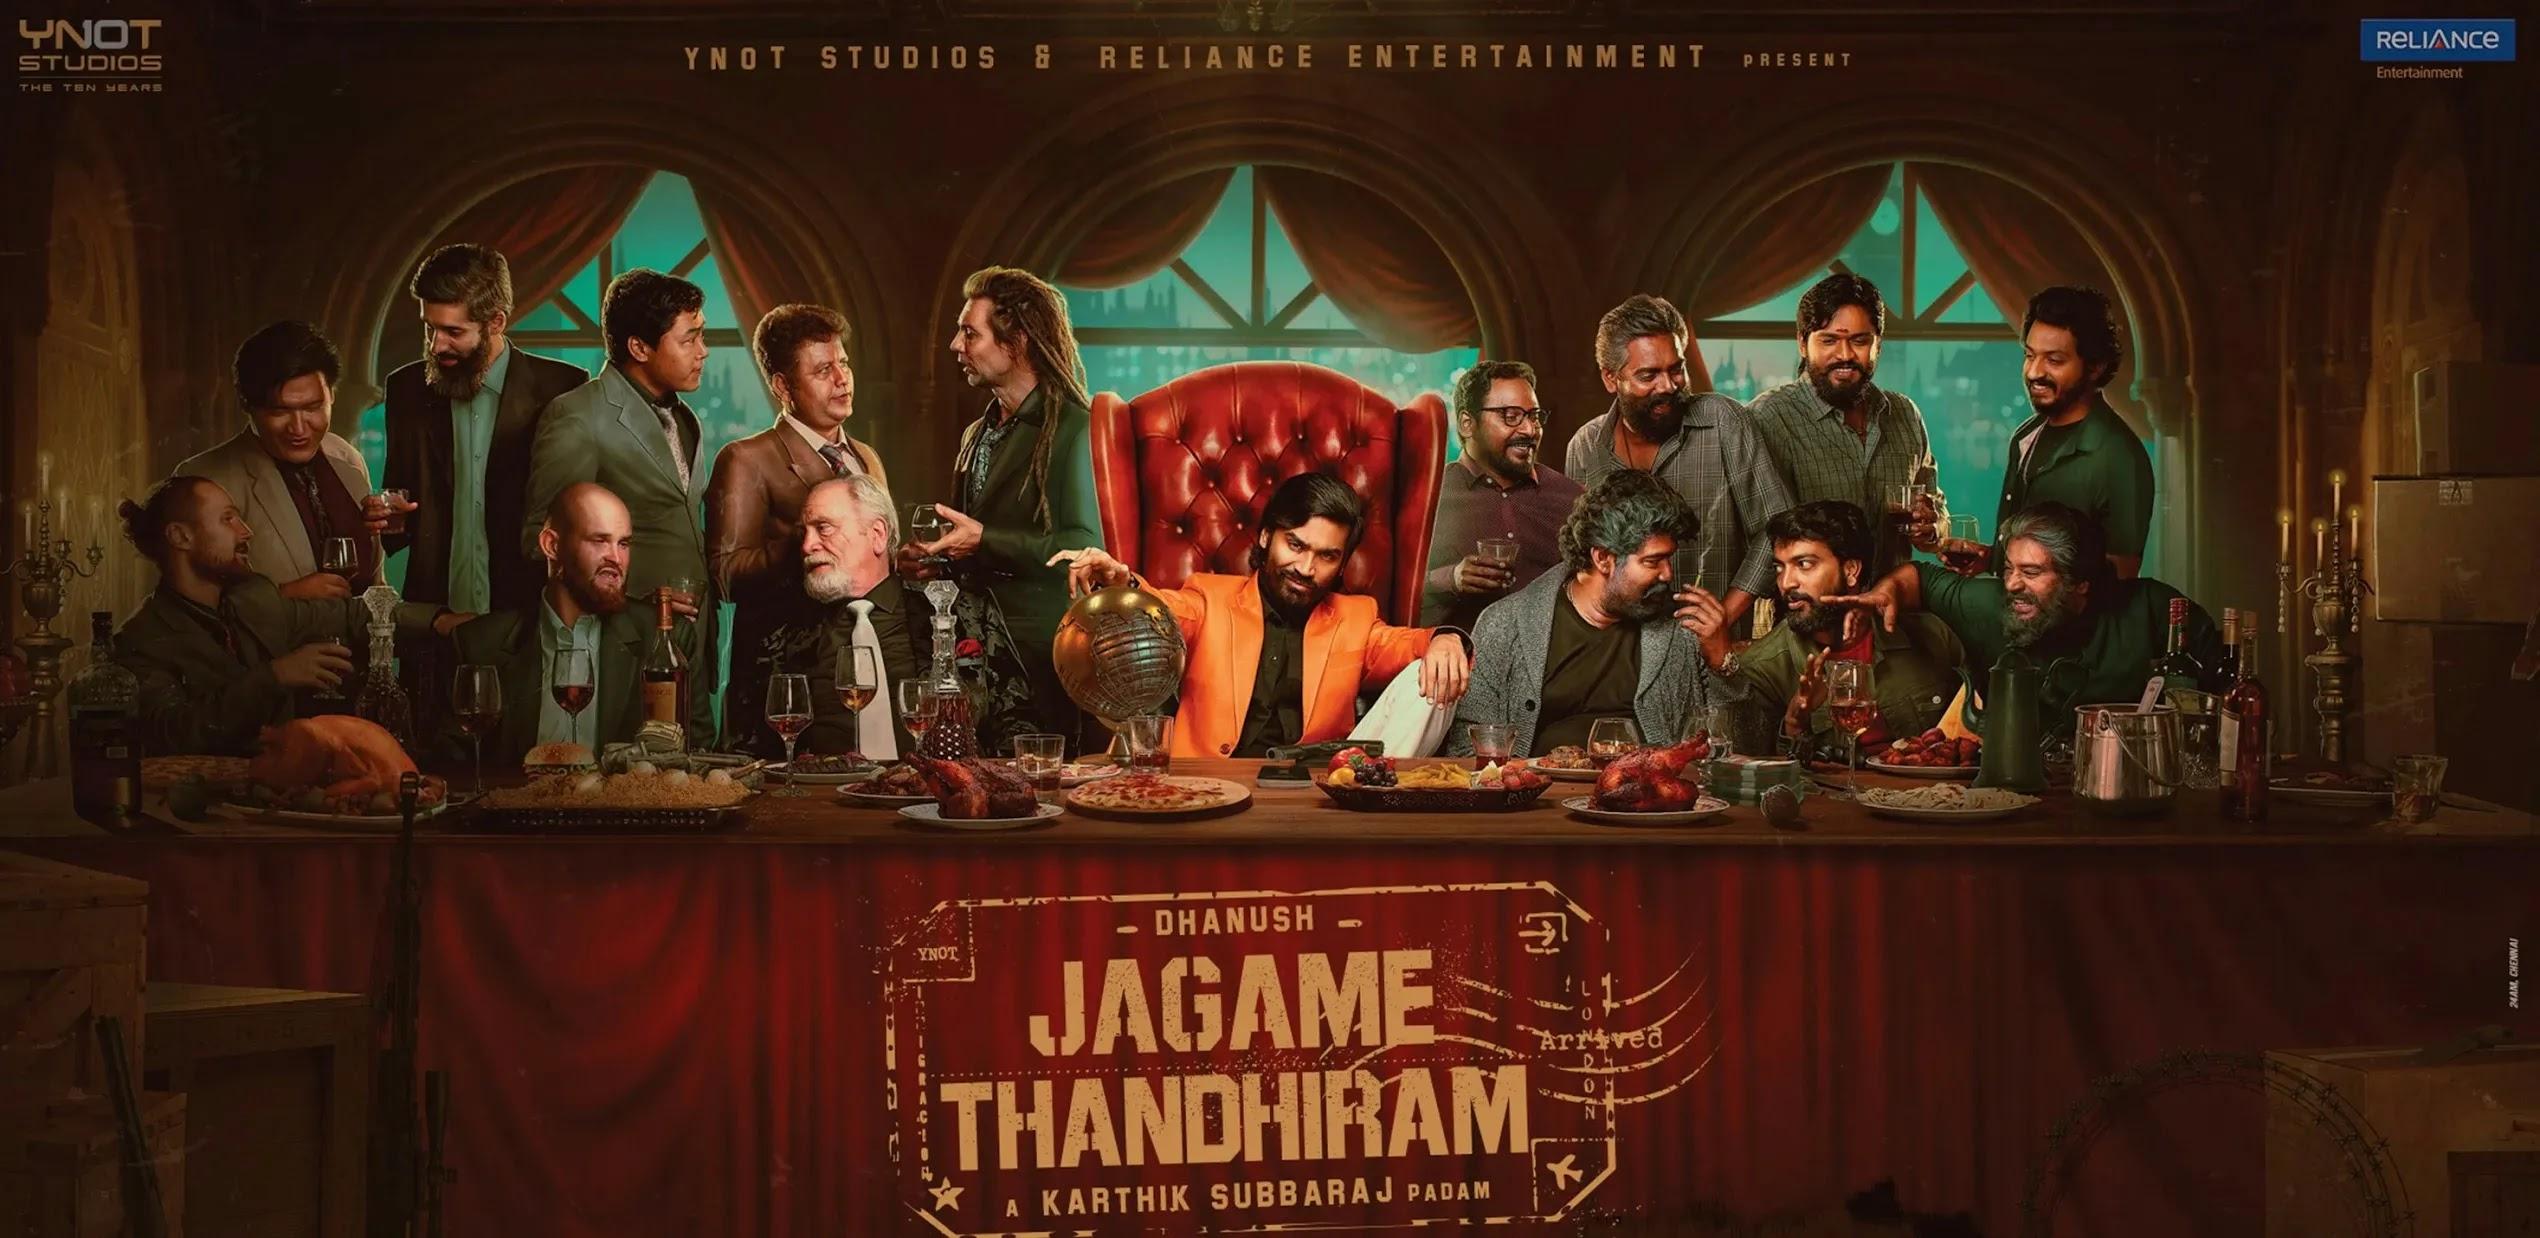 Jagame Thandhiram 2021 Hindi Dubbed Download